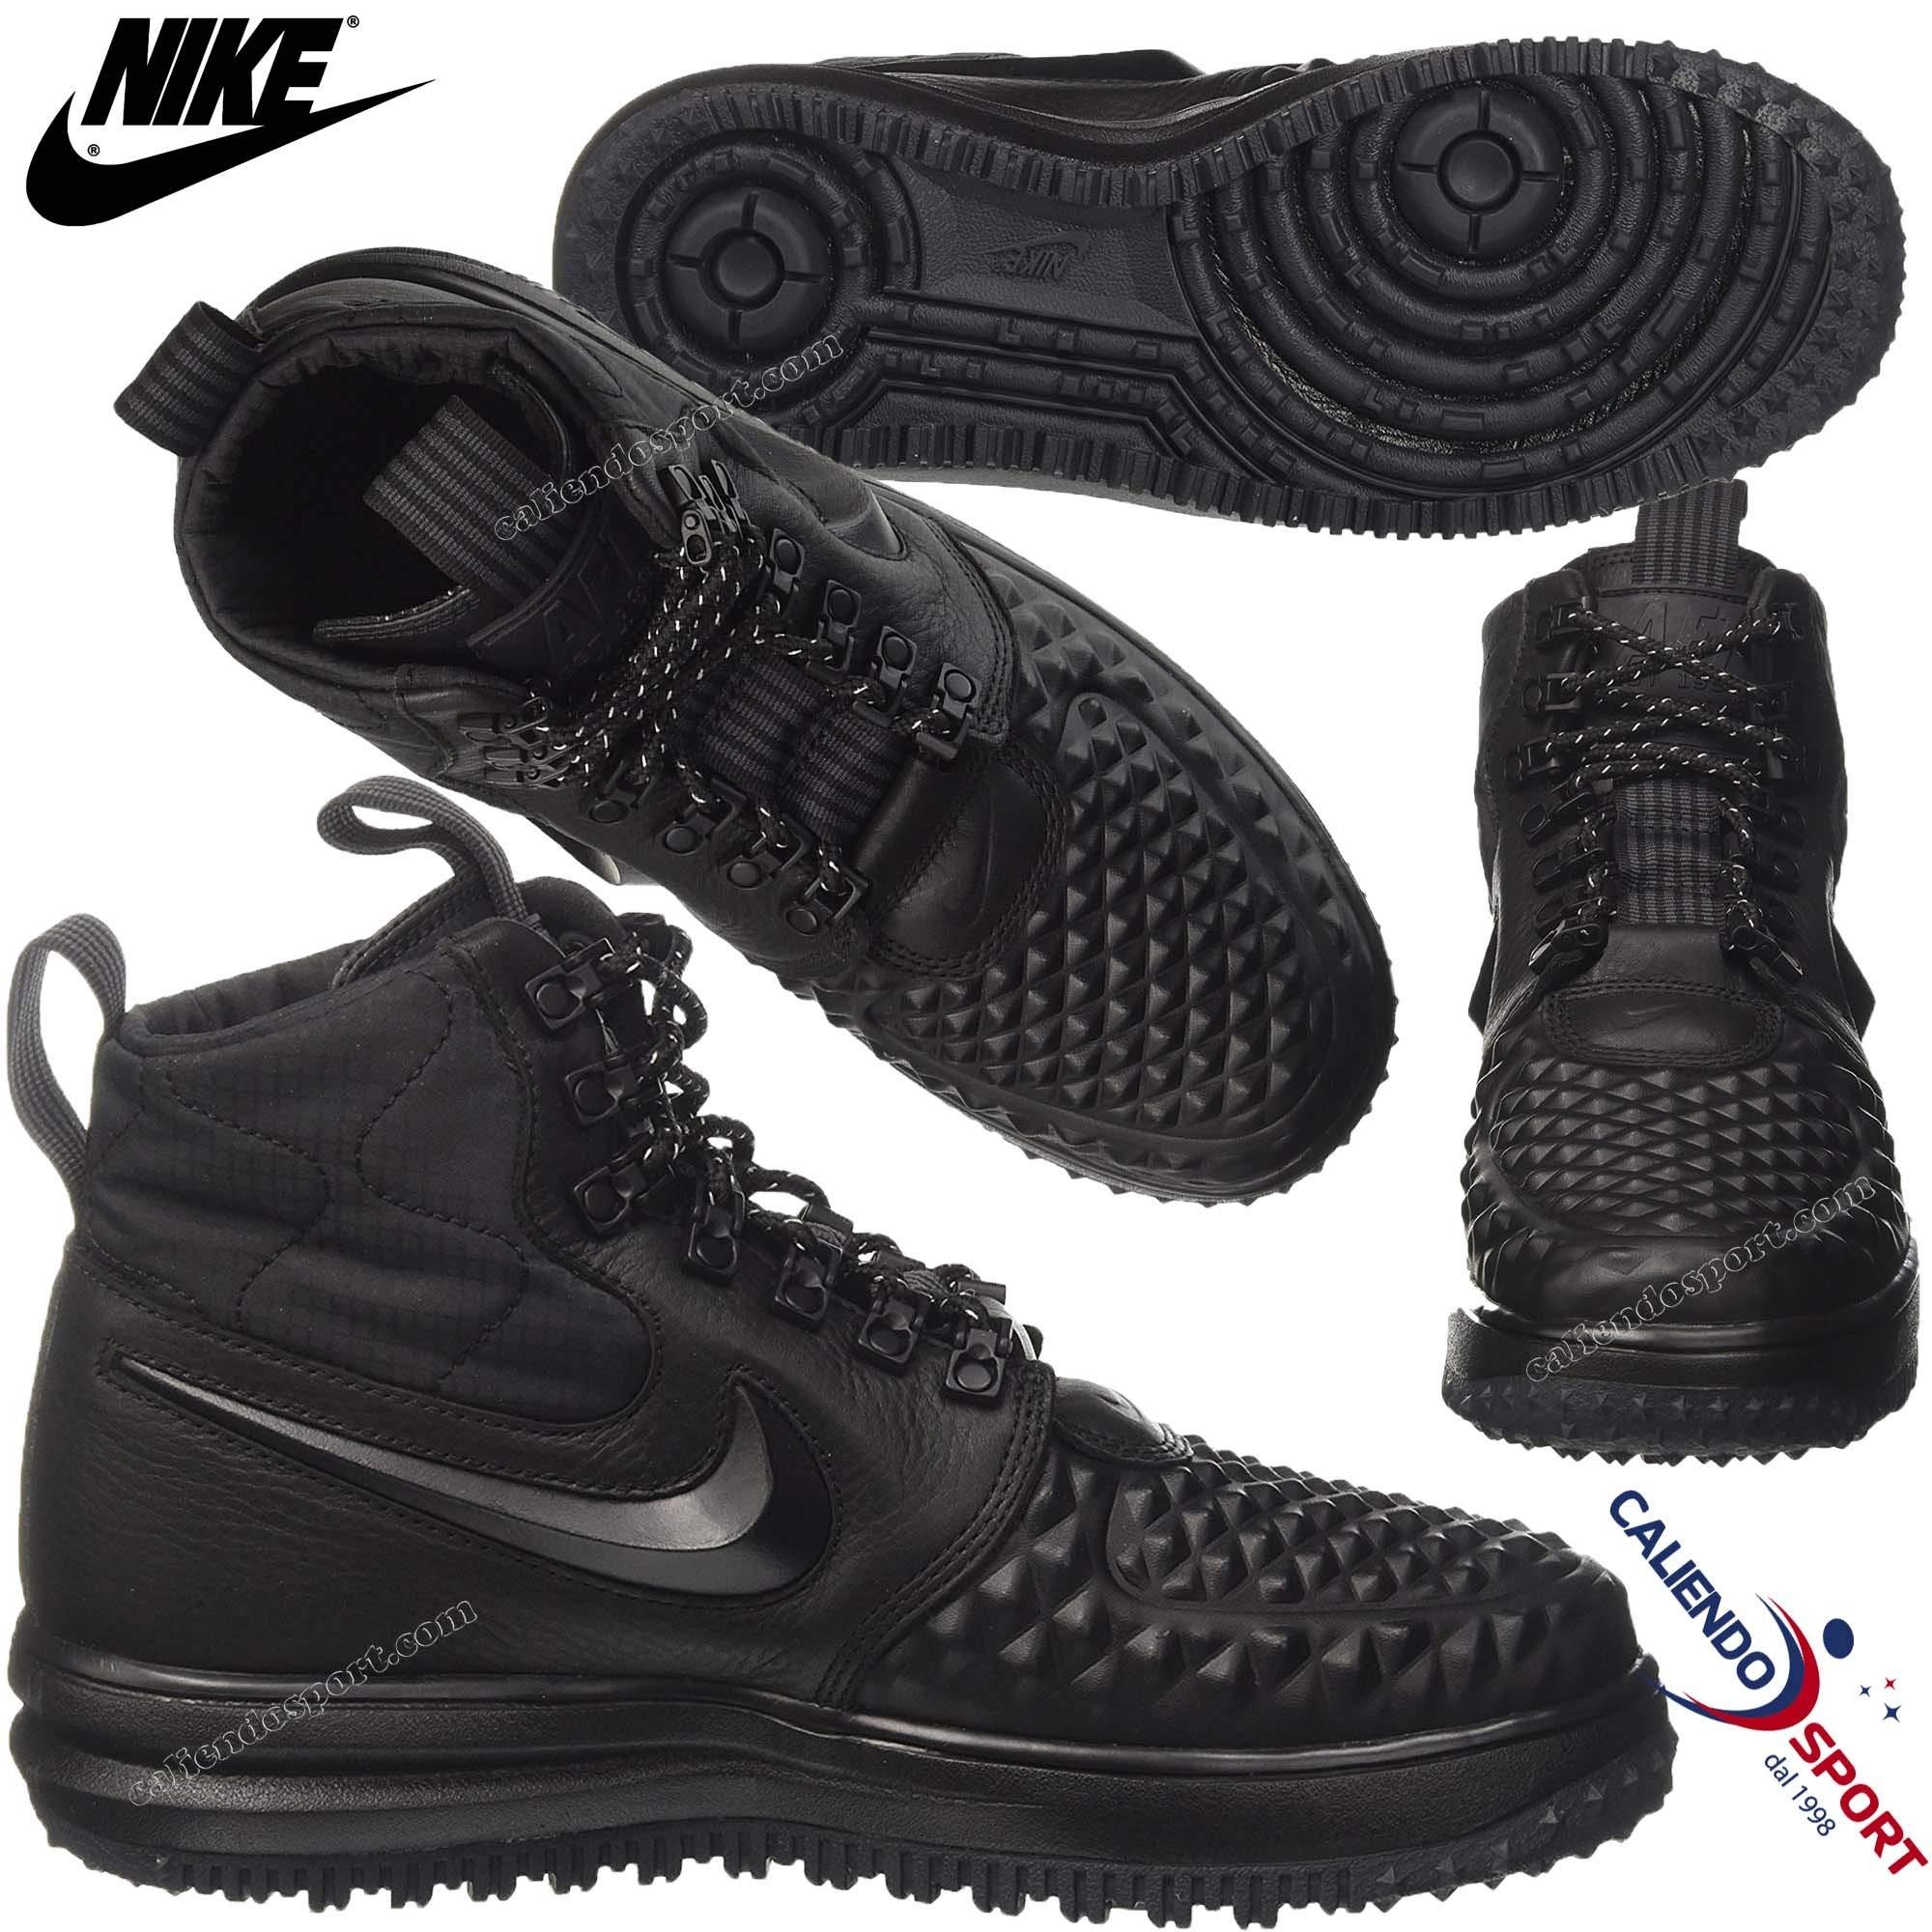 Nike WMNS Lunar Force 1 Duckboot Women Casual, BlackBlack White, Size 6.5